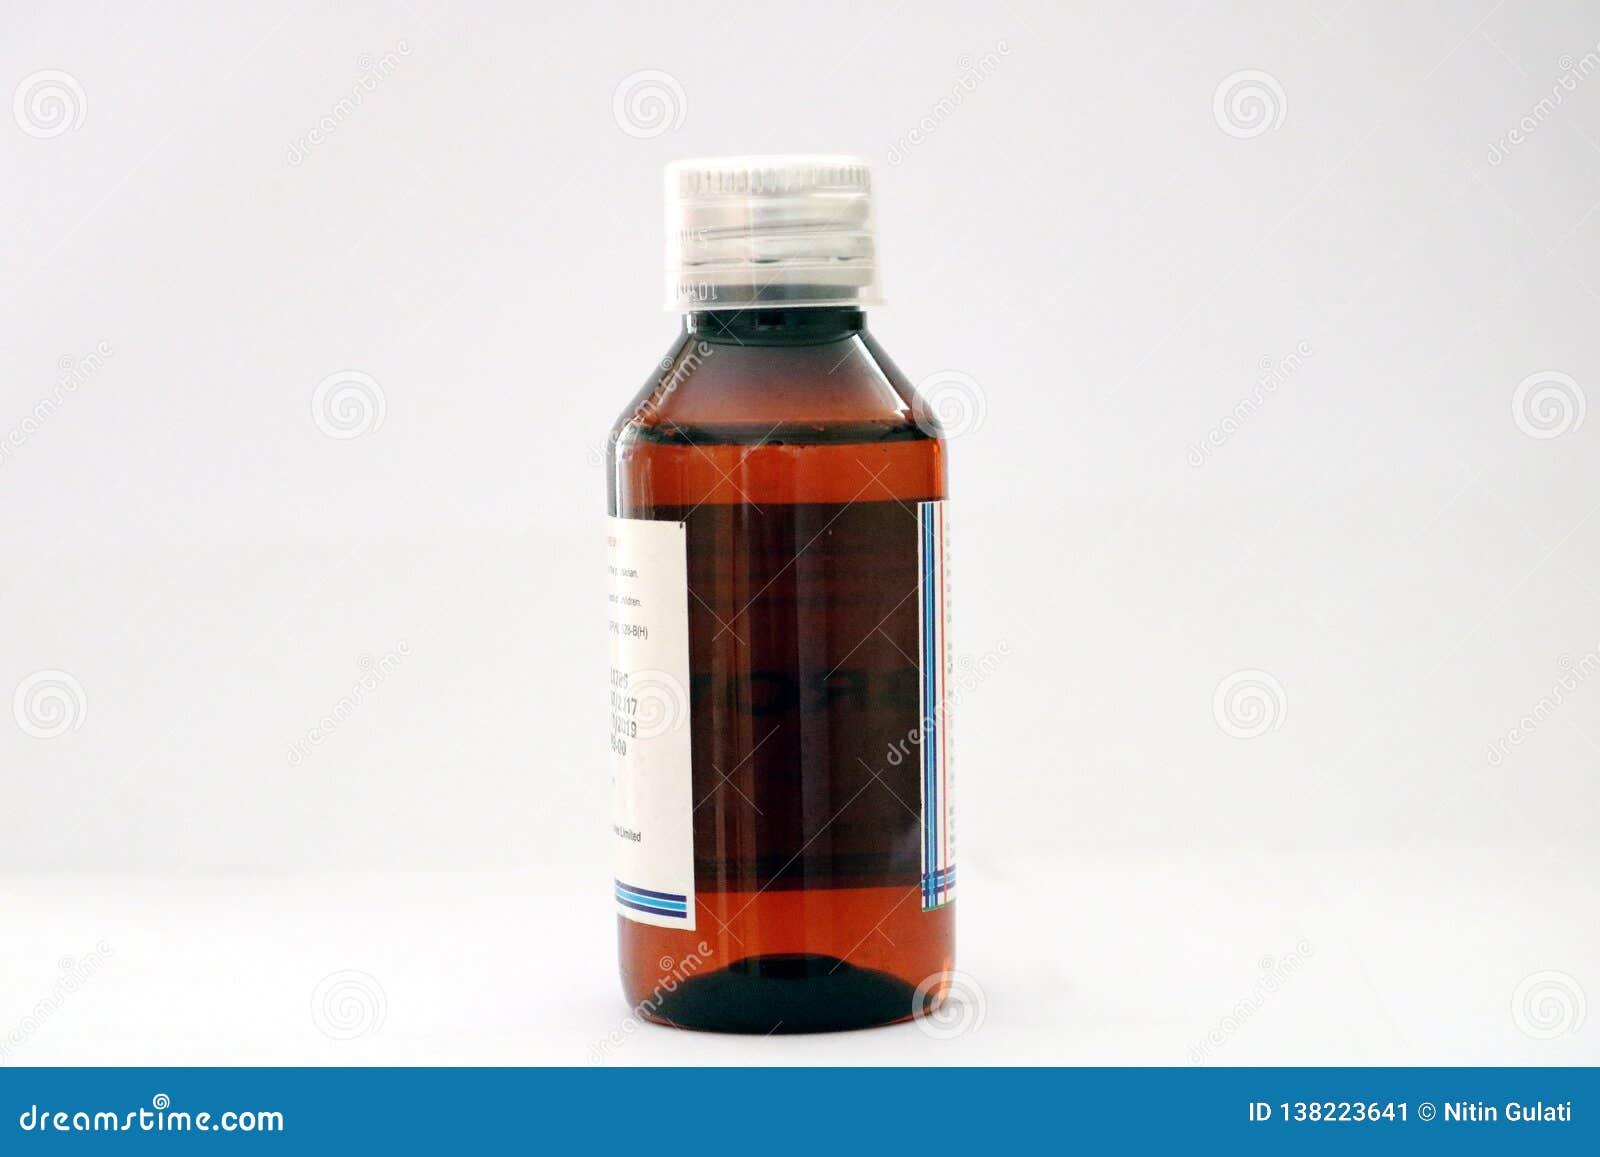 Een amber gekleurde fles van het geneeskundehuisdier met transparante dosering GLB